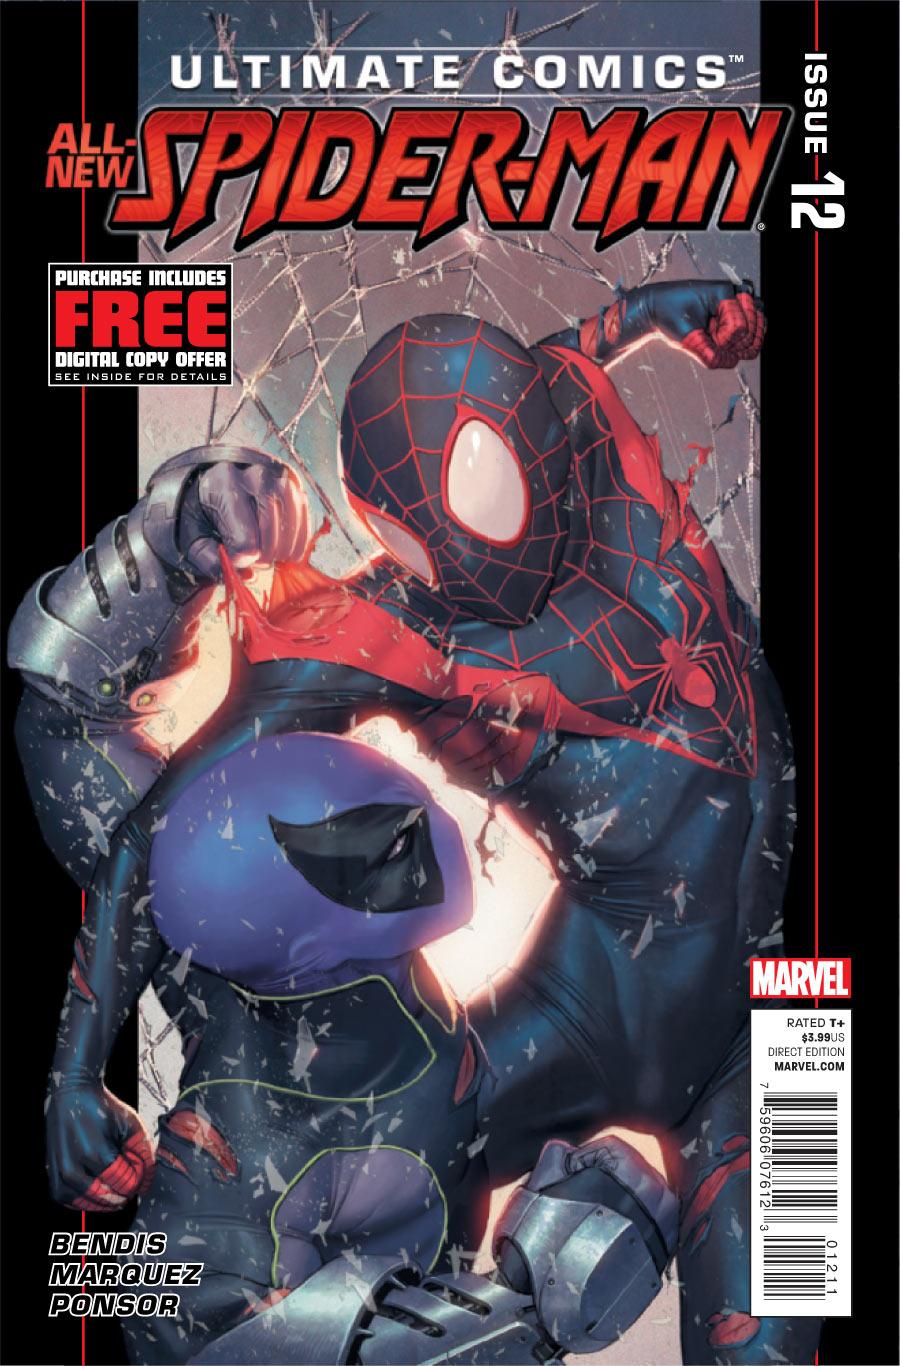 Ultimate comics spider man v2 10 12 review - Marvel spiderman comics pdf ...